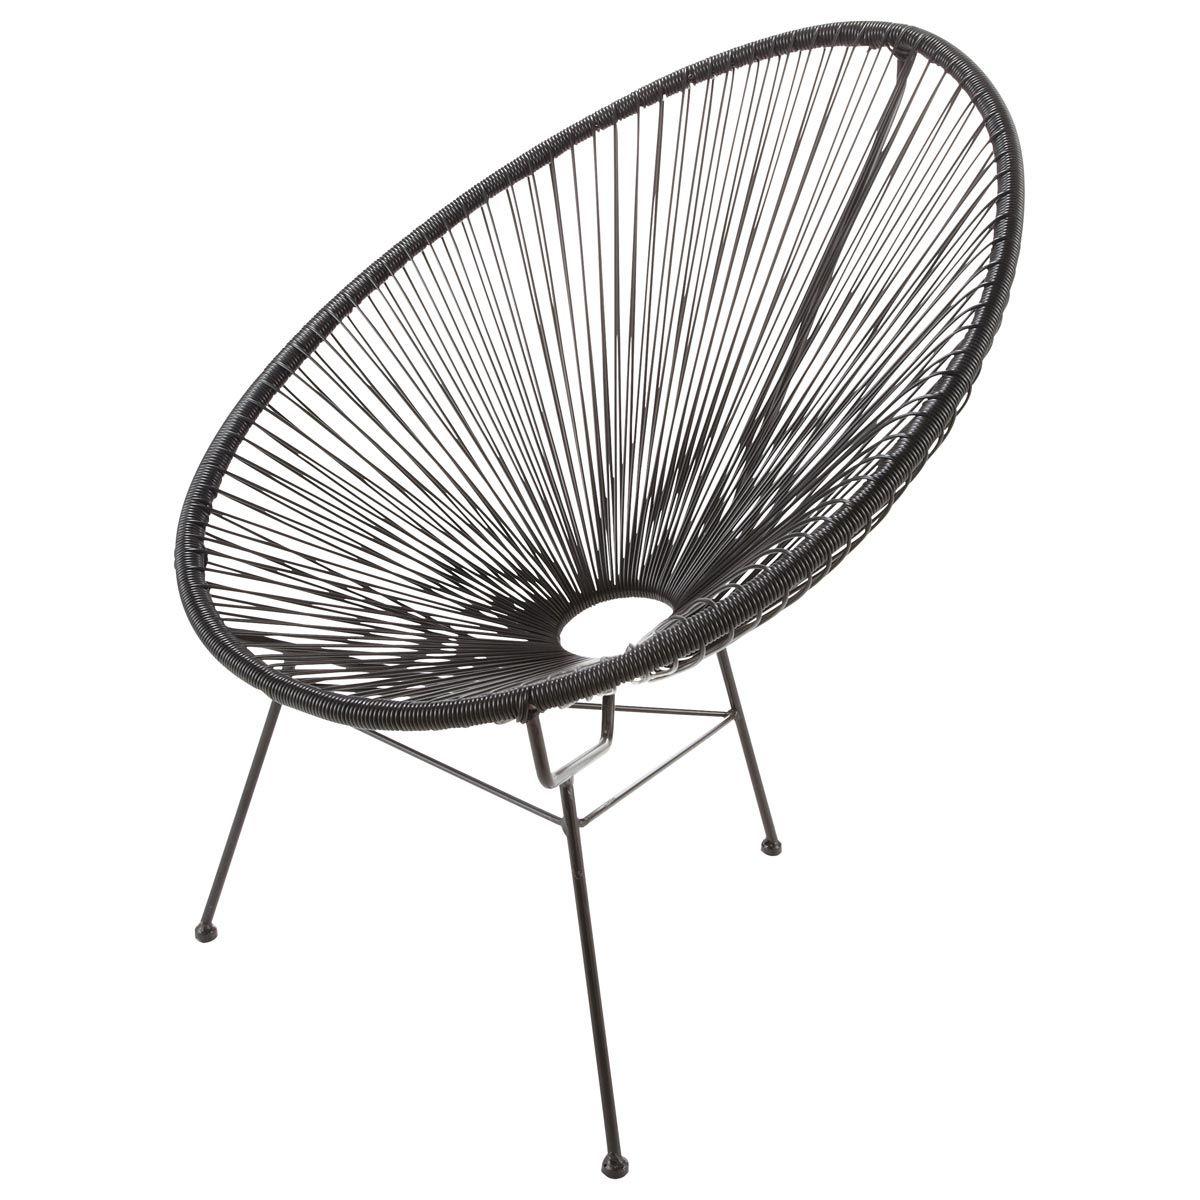 Fauteuil de jardin rond noir | furniture | Pinterest | Furniture ...